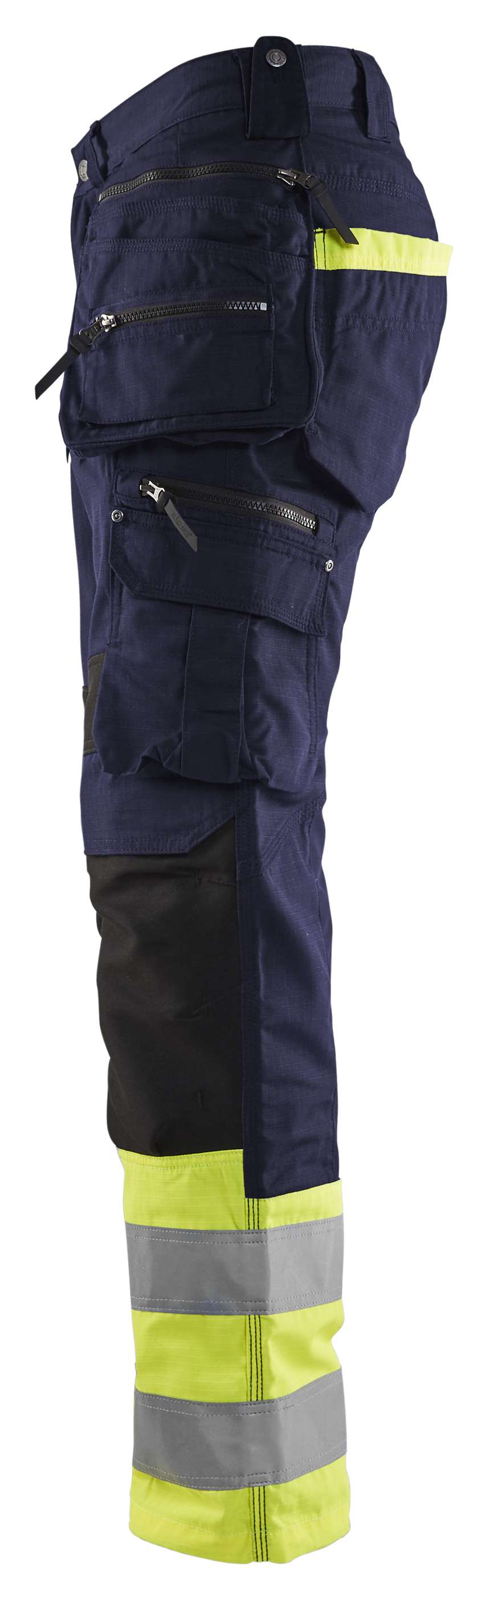 Blaklader Werkbroeken 19941330 High Vis marineblauw-fluo geel(8933)